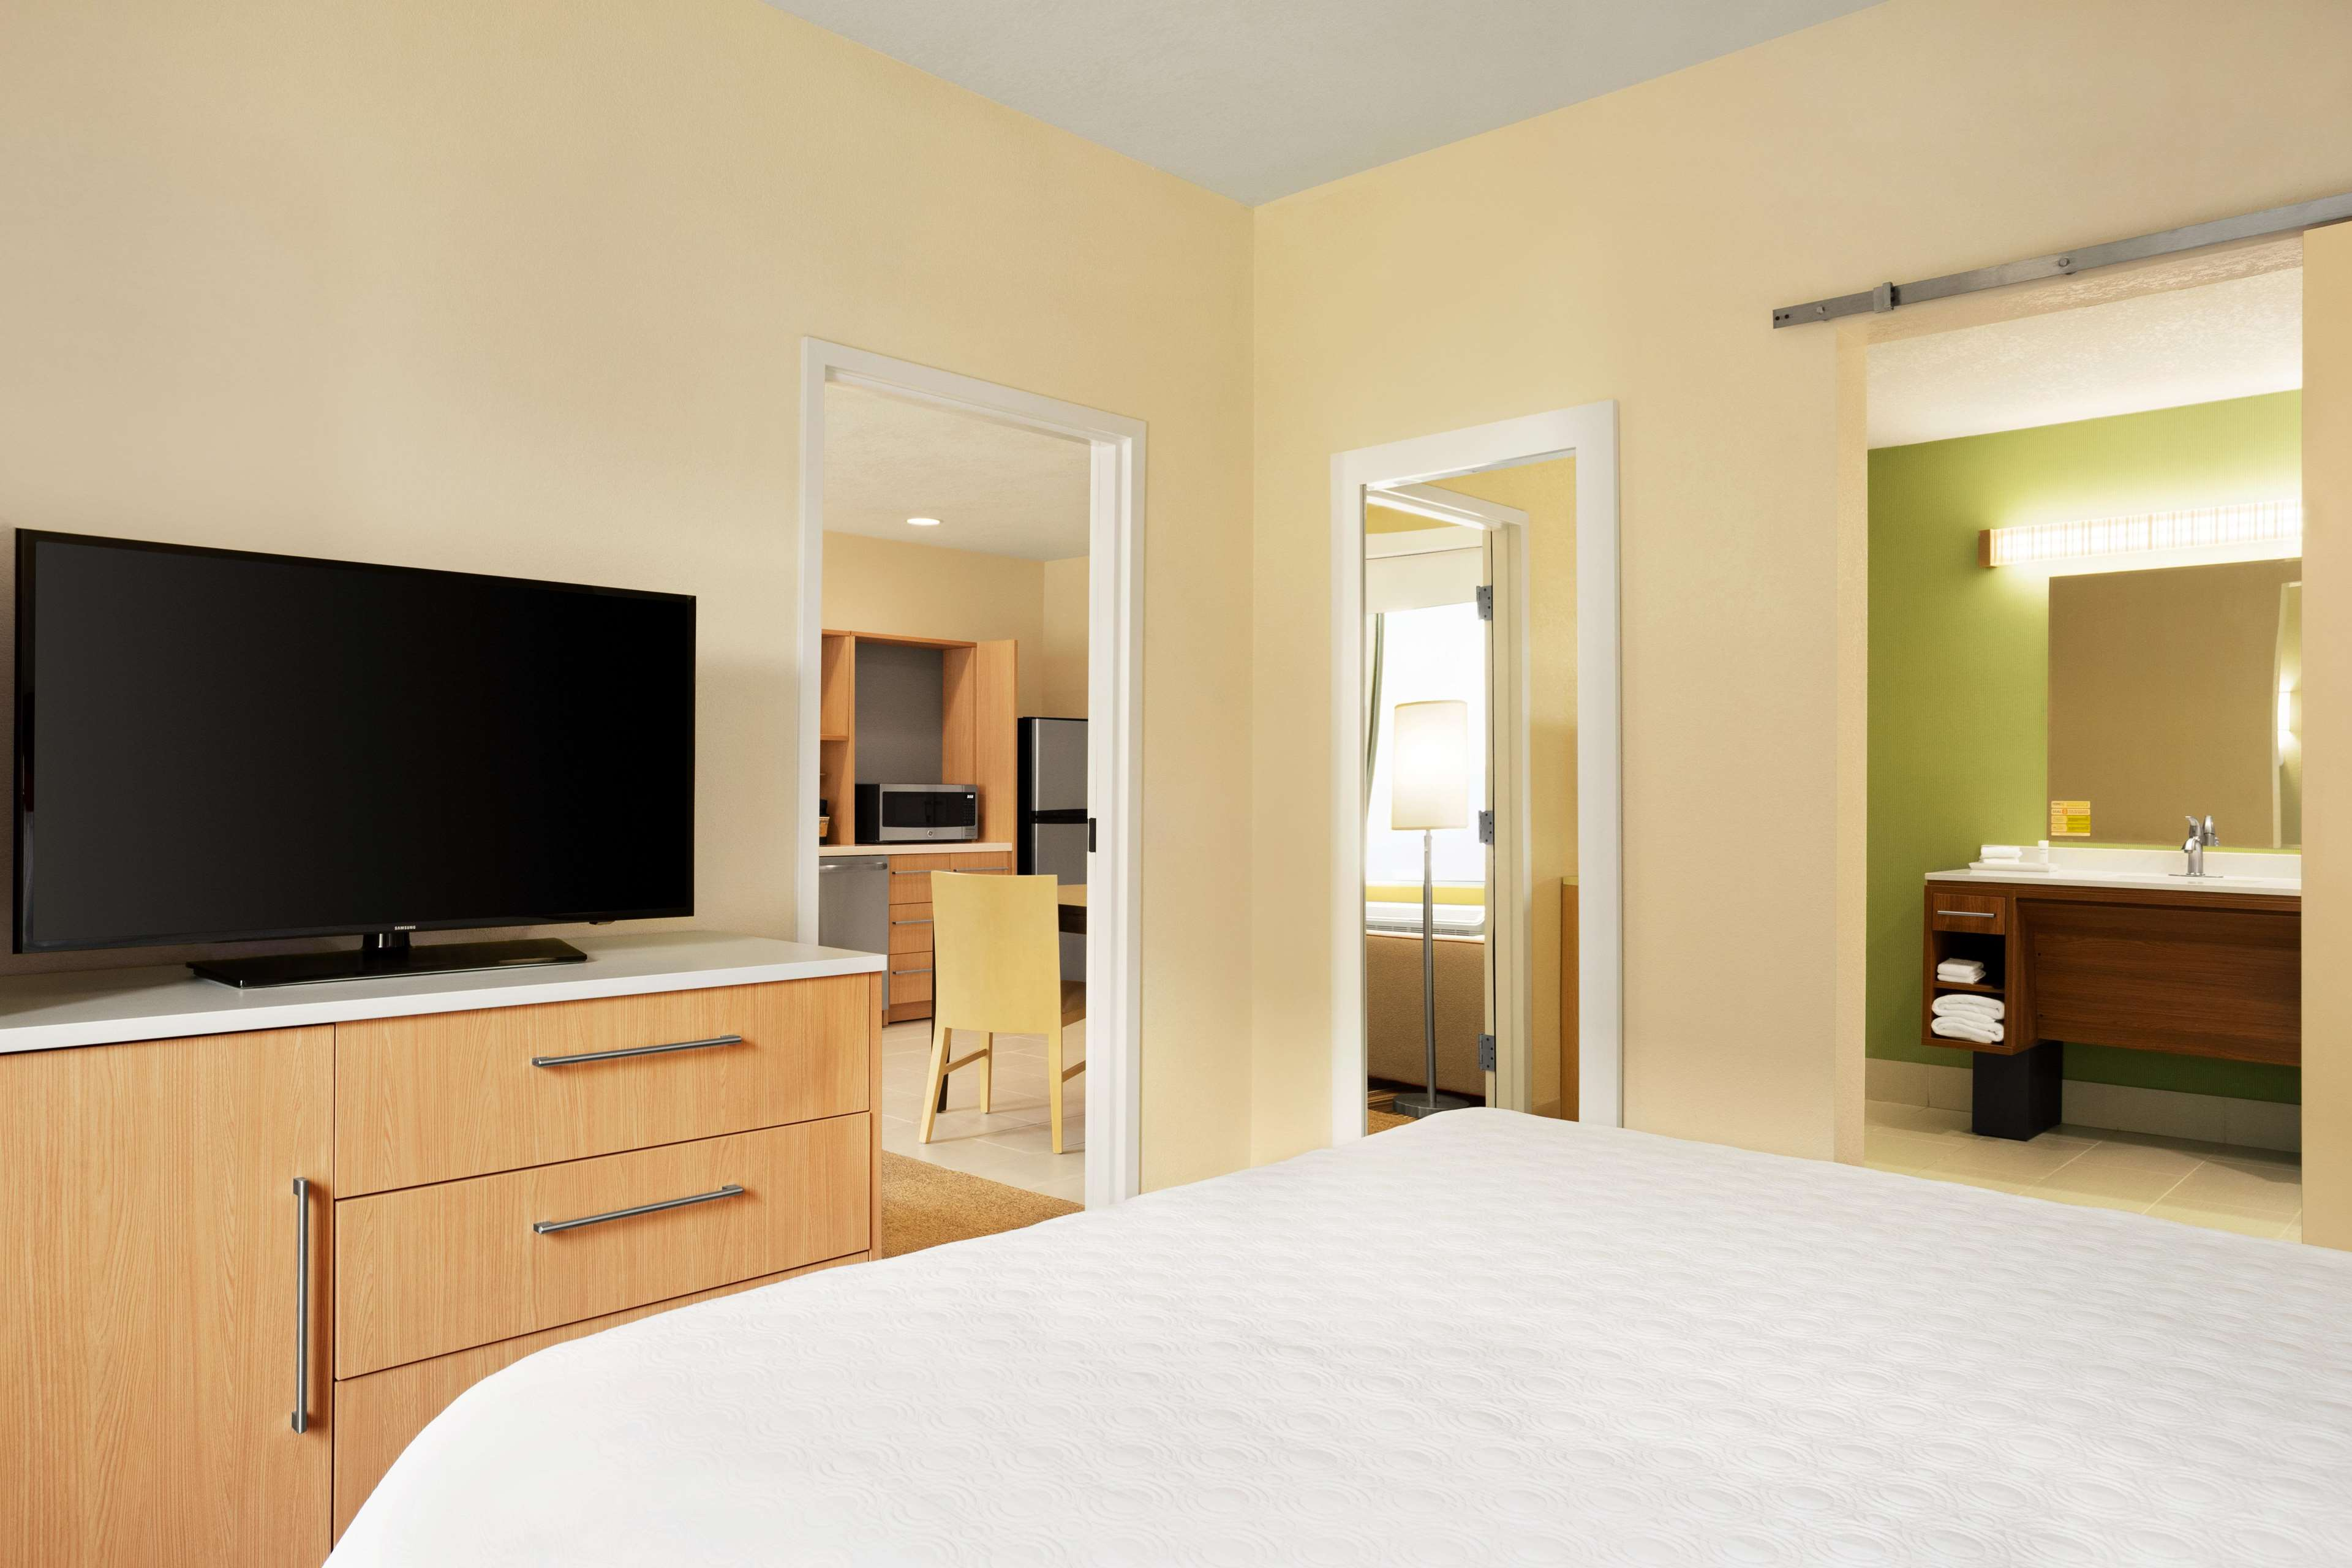 Home2 Suites by Hilton Elko image 27